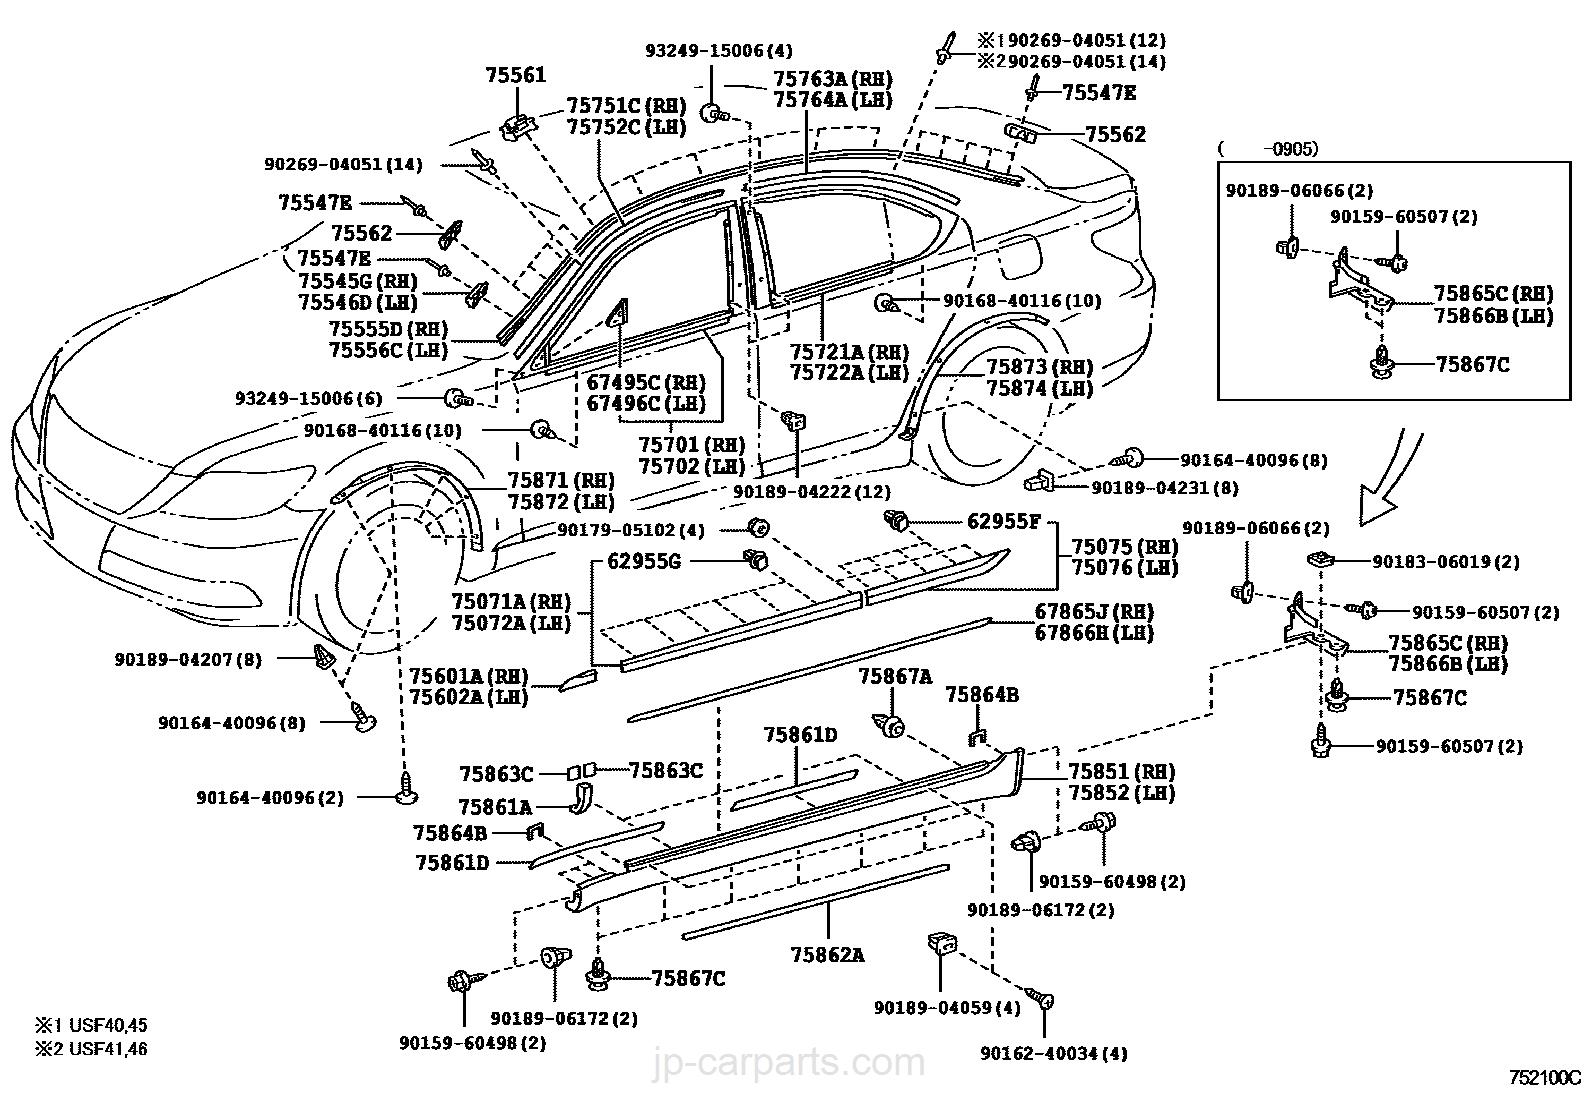 2002 mercury cougar parts diagram ford escape ignition wiring auto